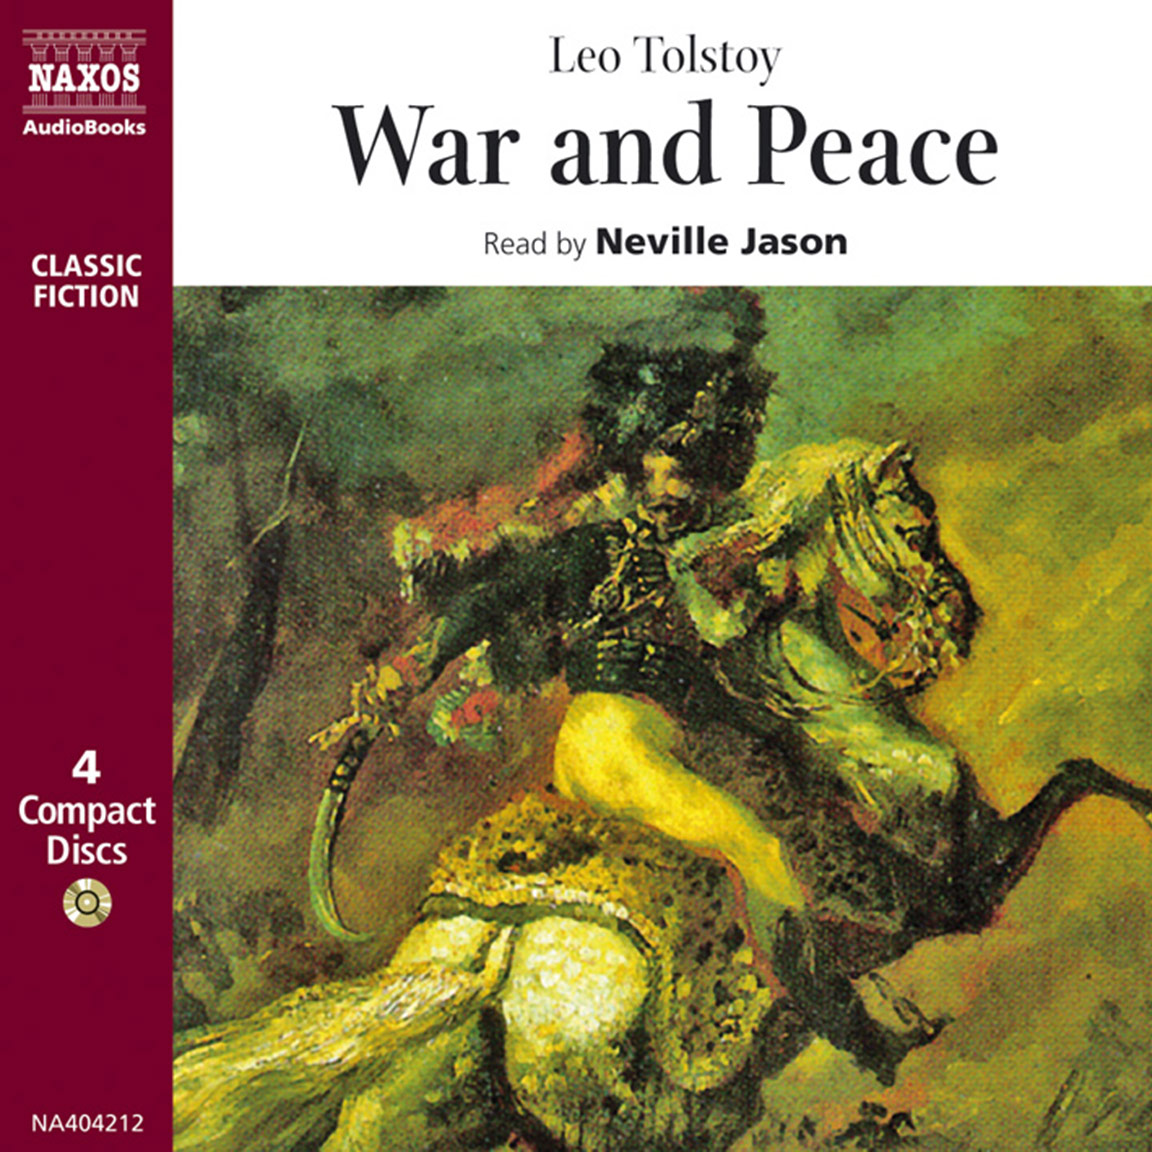 War and Peace (abridged)